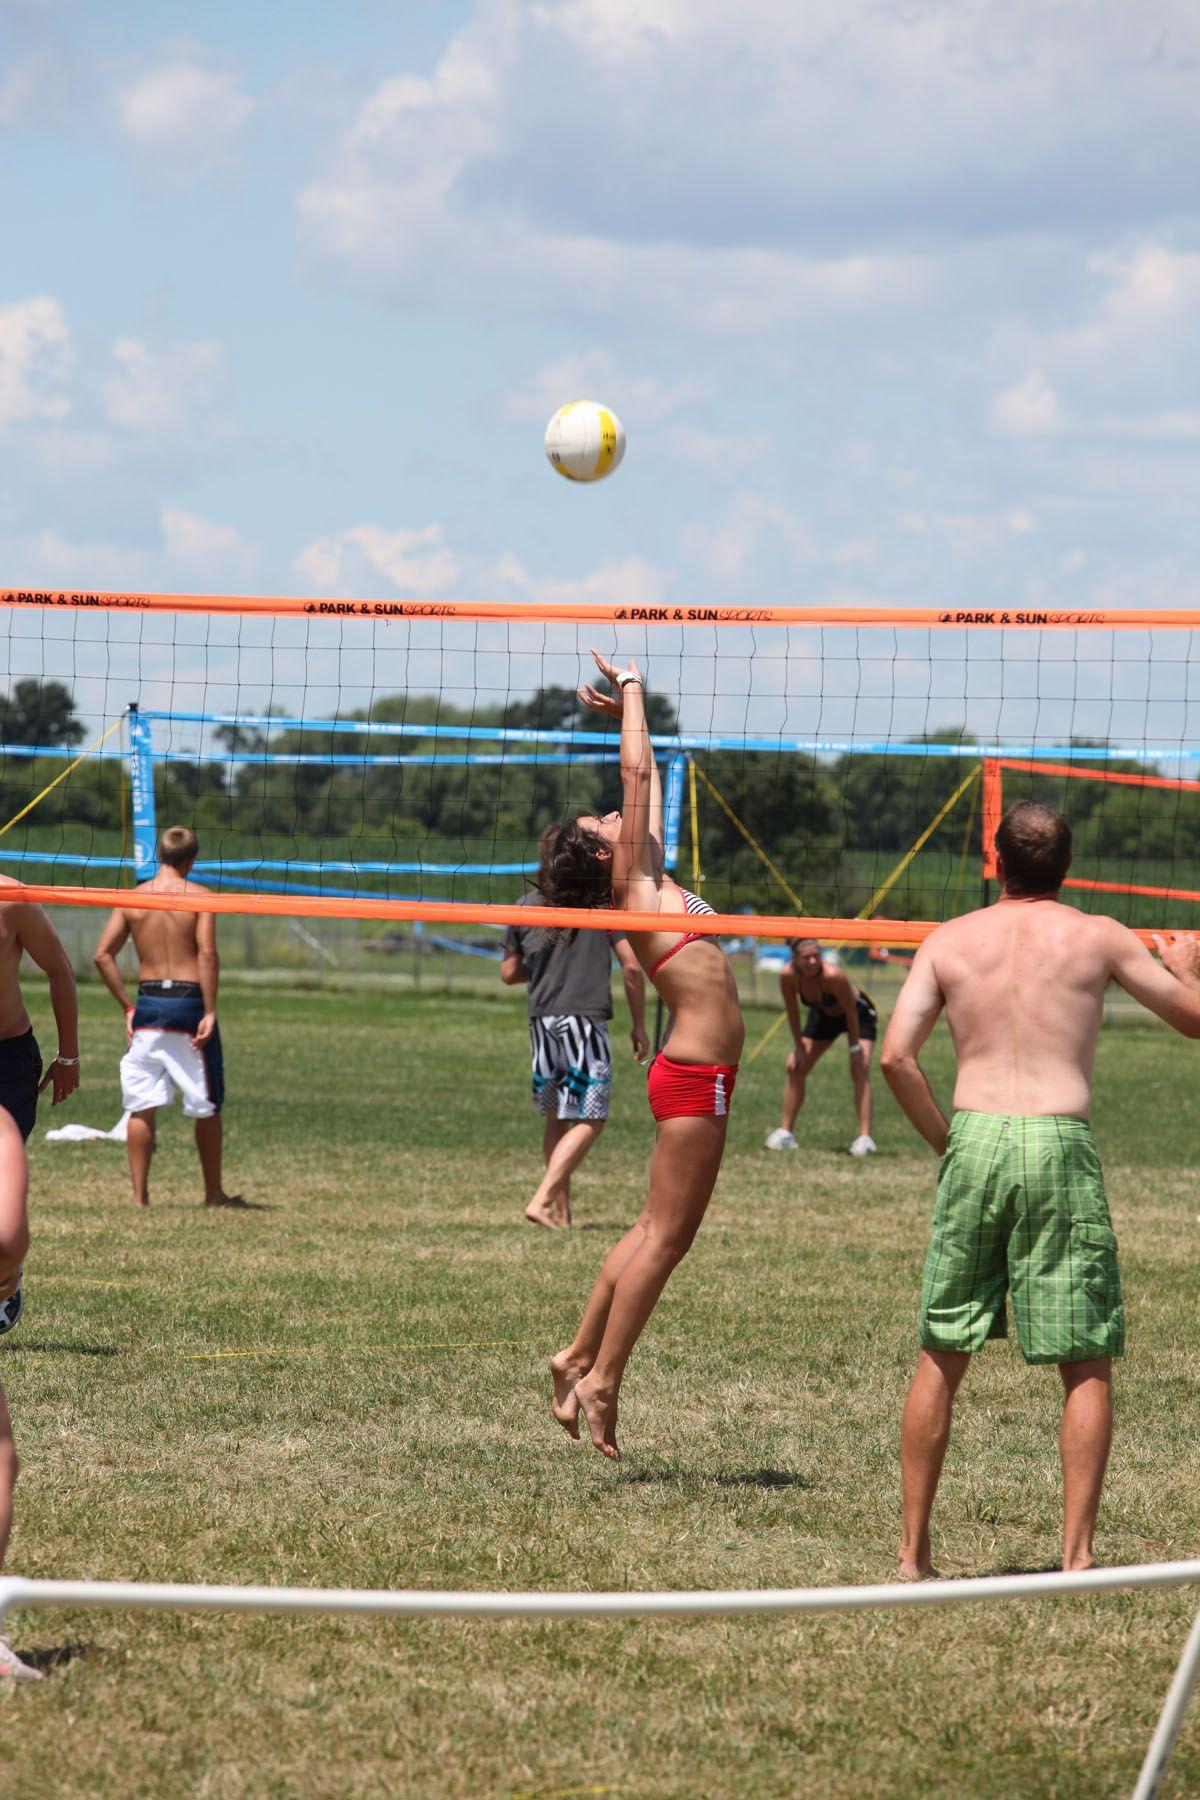 Us Open Grass Volleyball Oshkosh Wi Volleyball Oshkosh Running